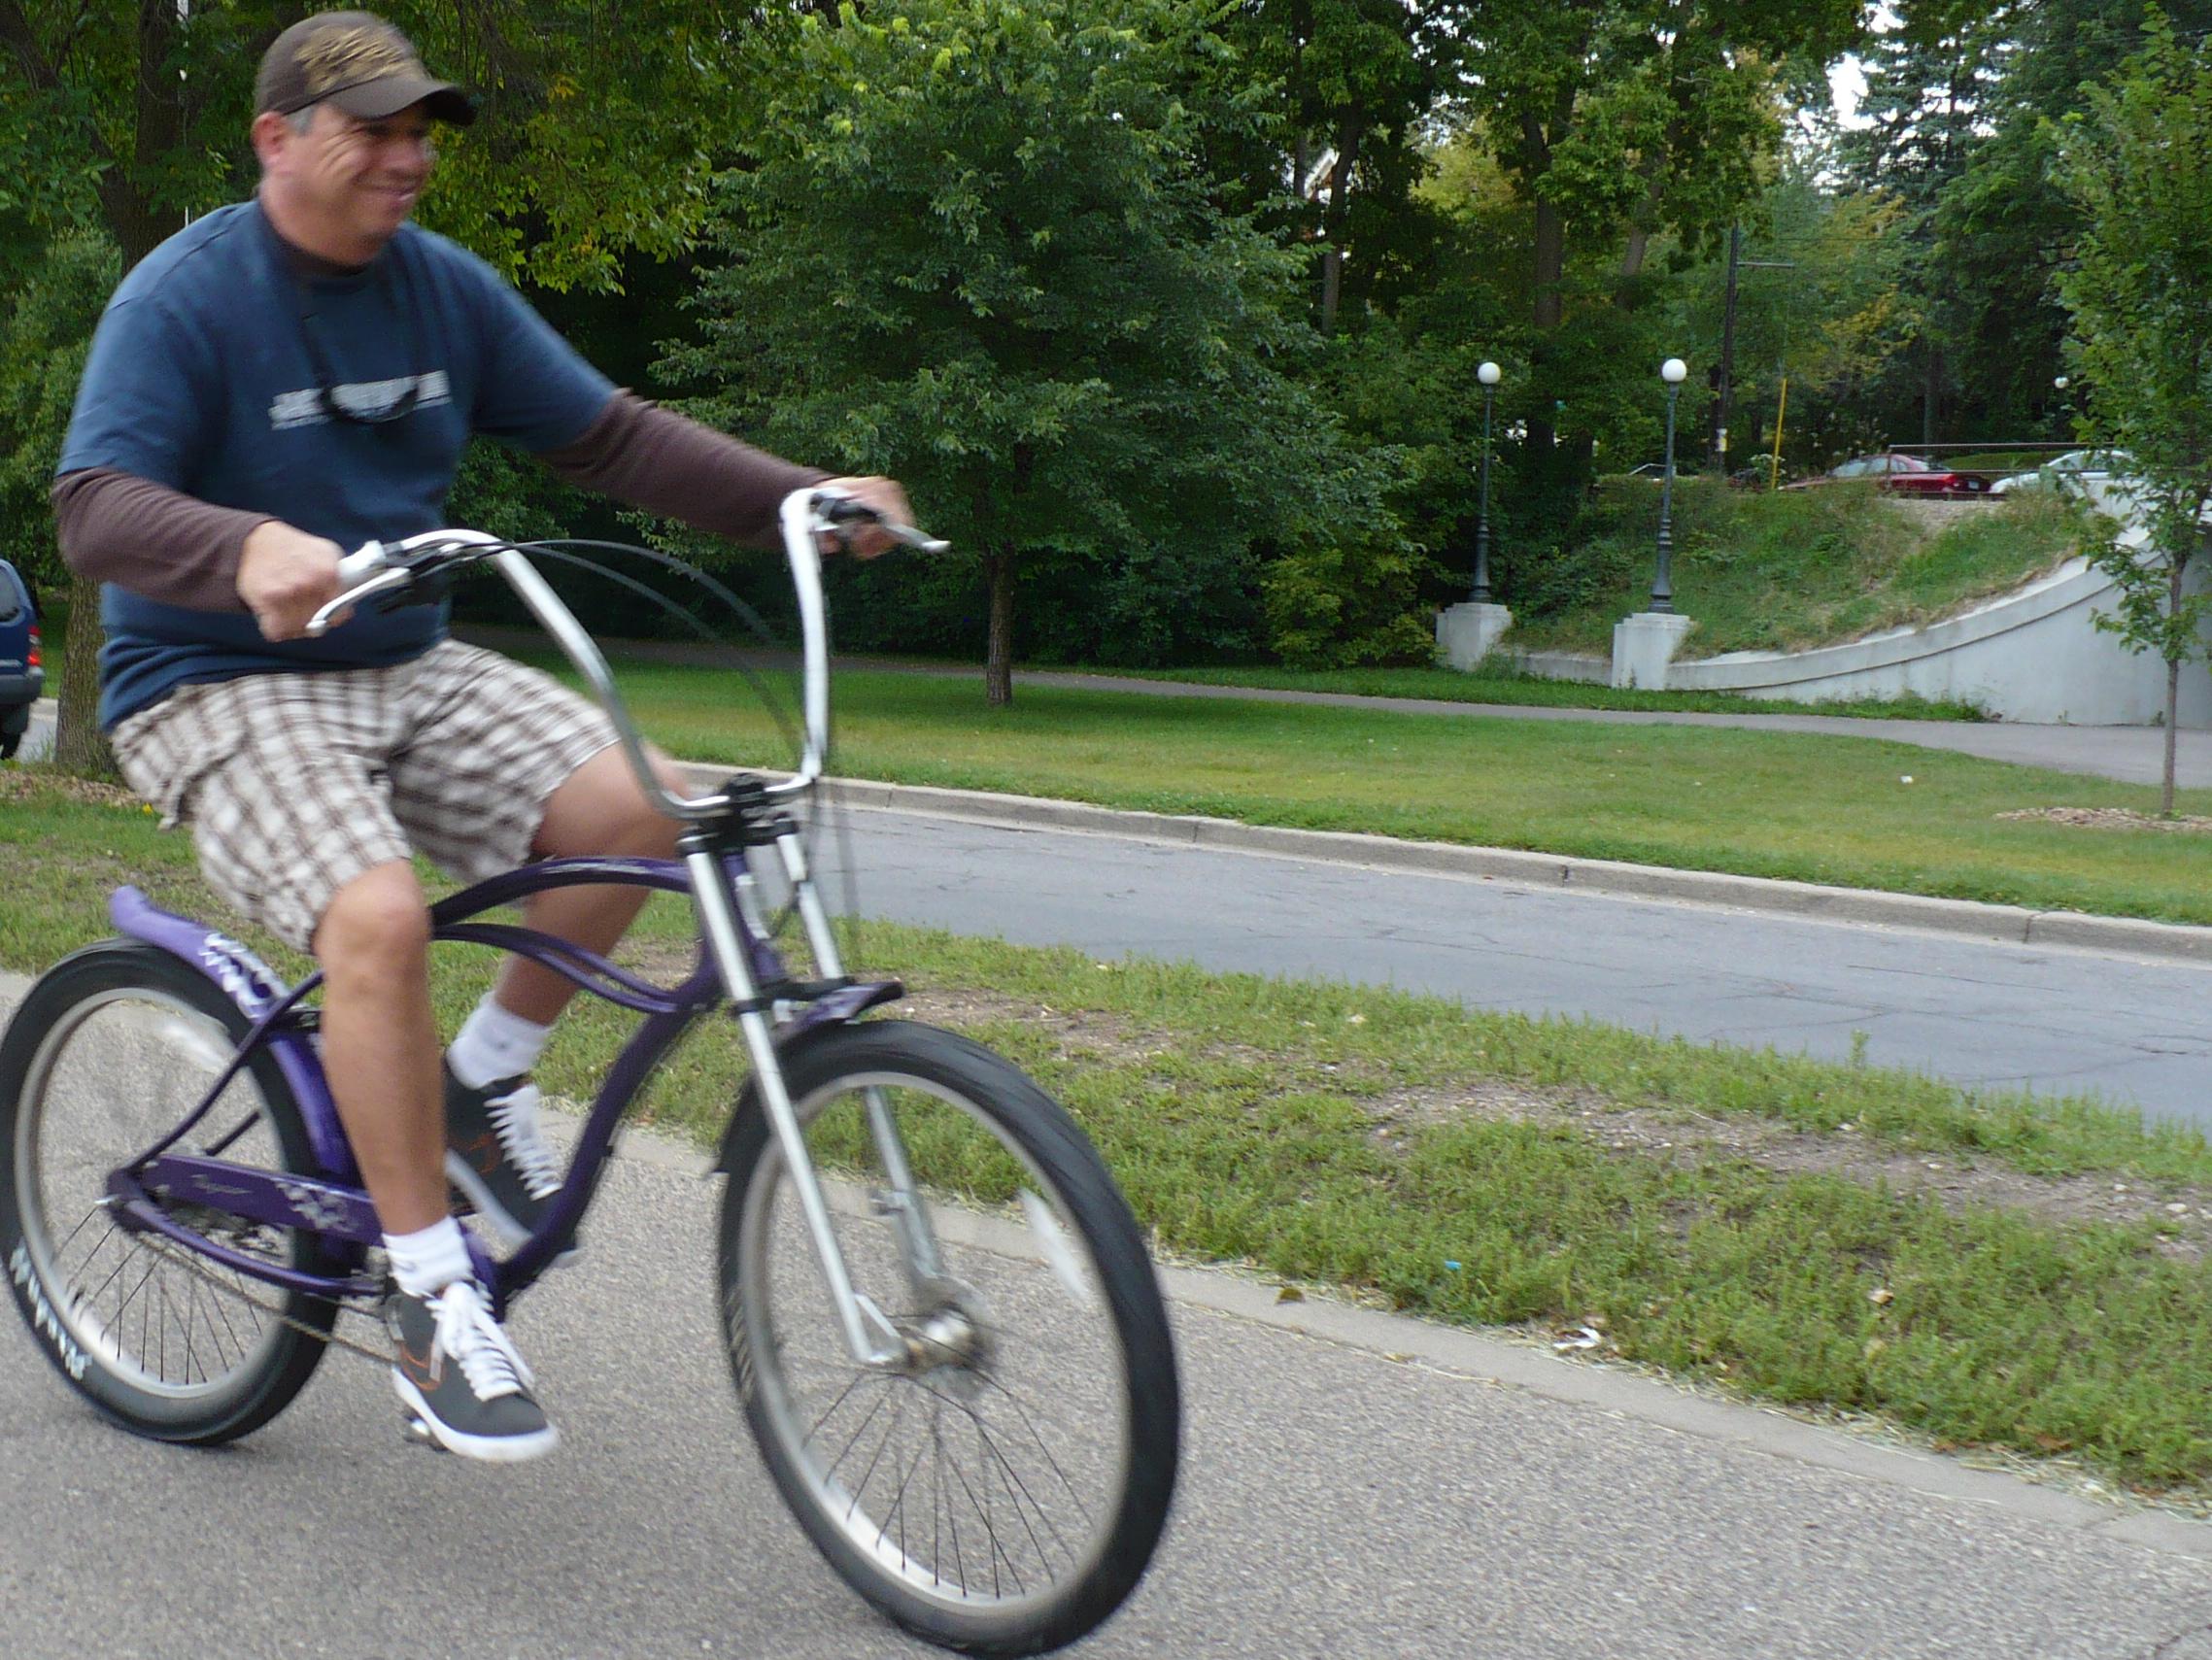 Bike Handlebars Cruiser Cruiser Bike Handlebars P